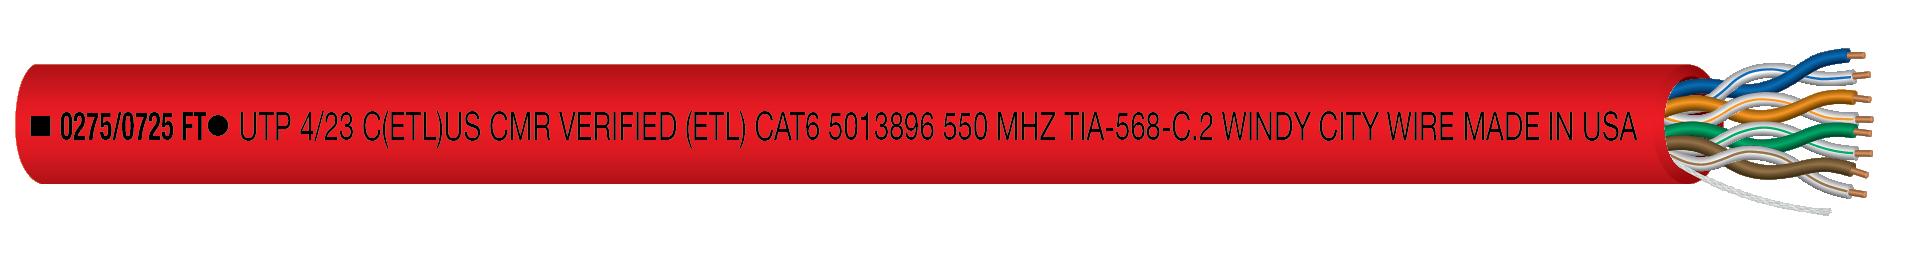 7756010-FP